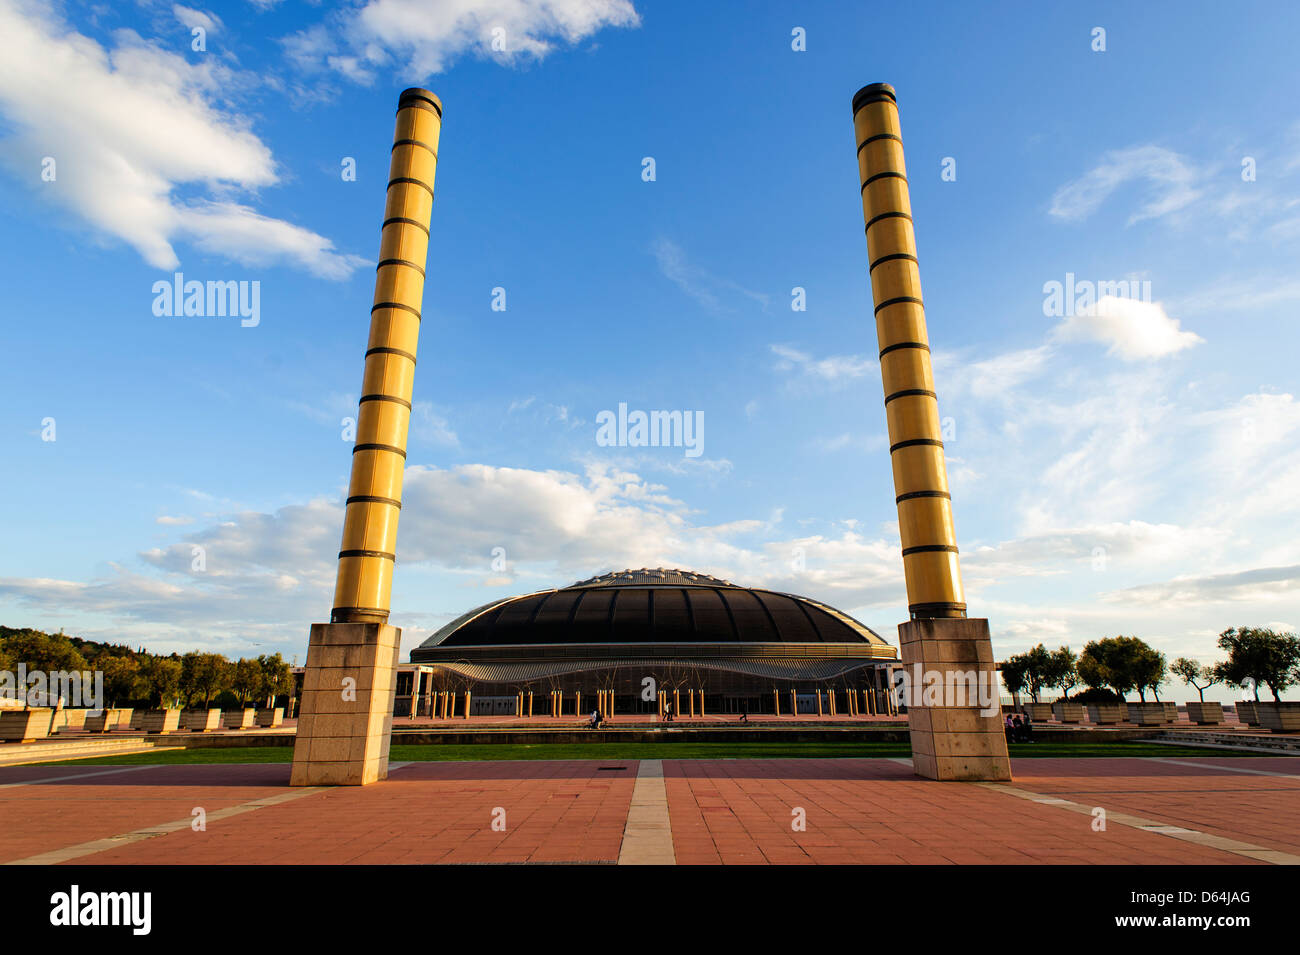 Palau Sant Jordi Olympic Stadium in Montjuic, Barcelona, Spain. - Stock Image